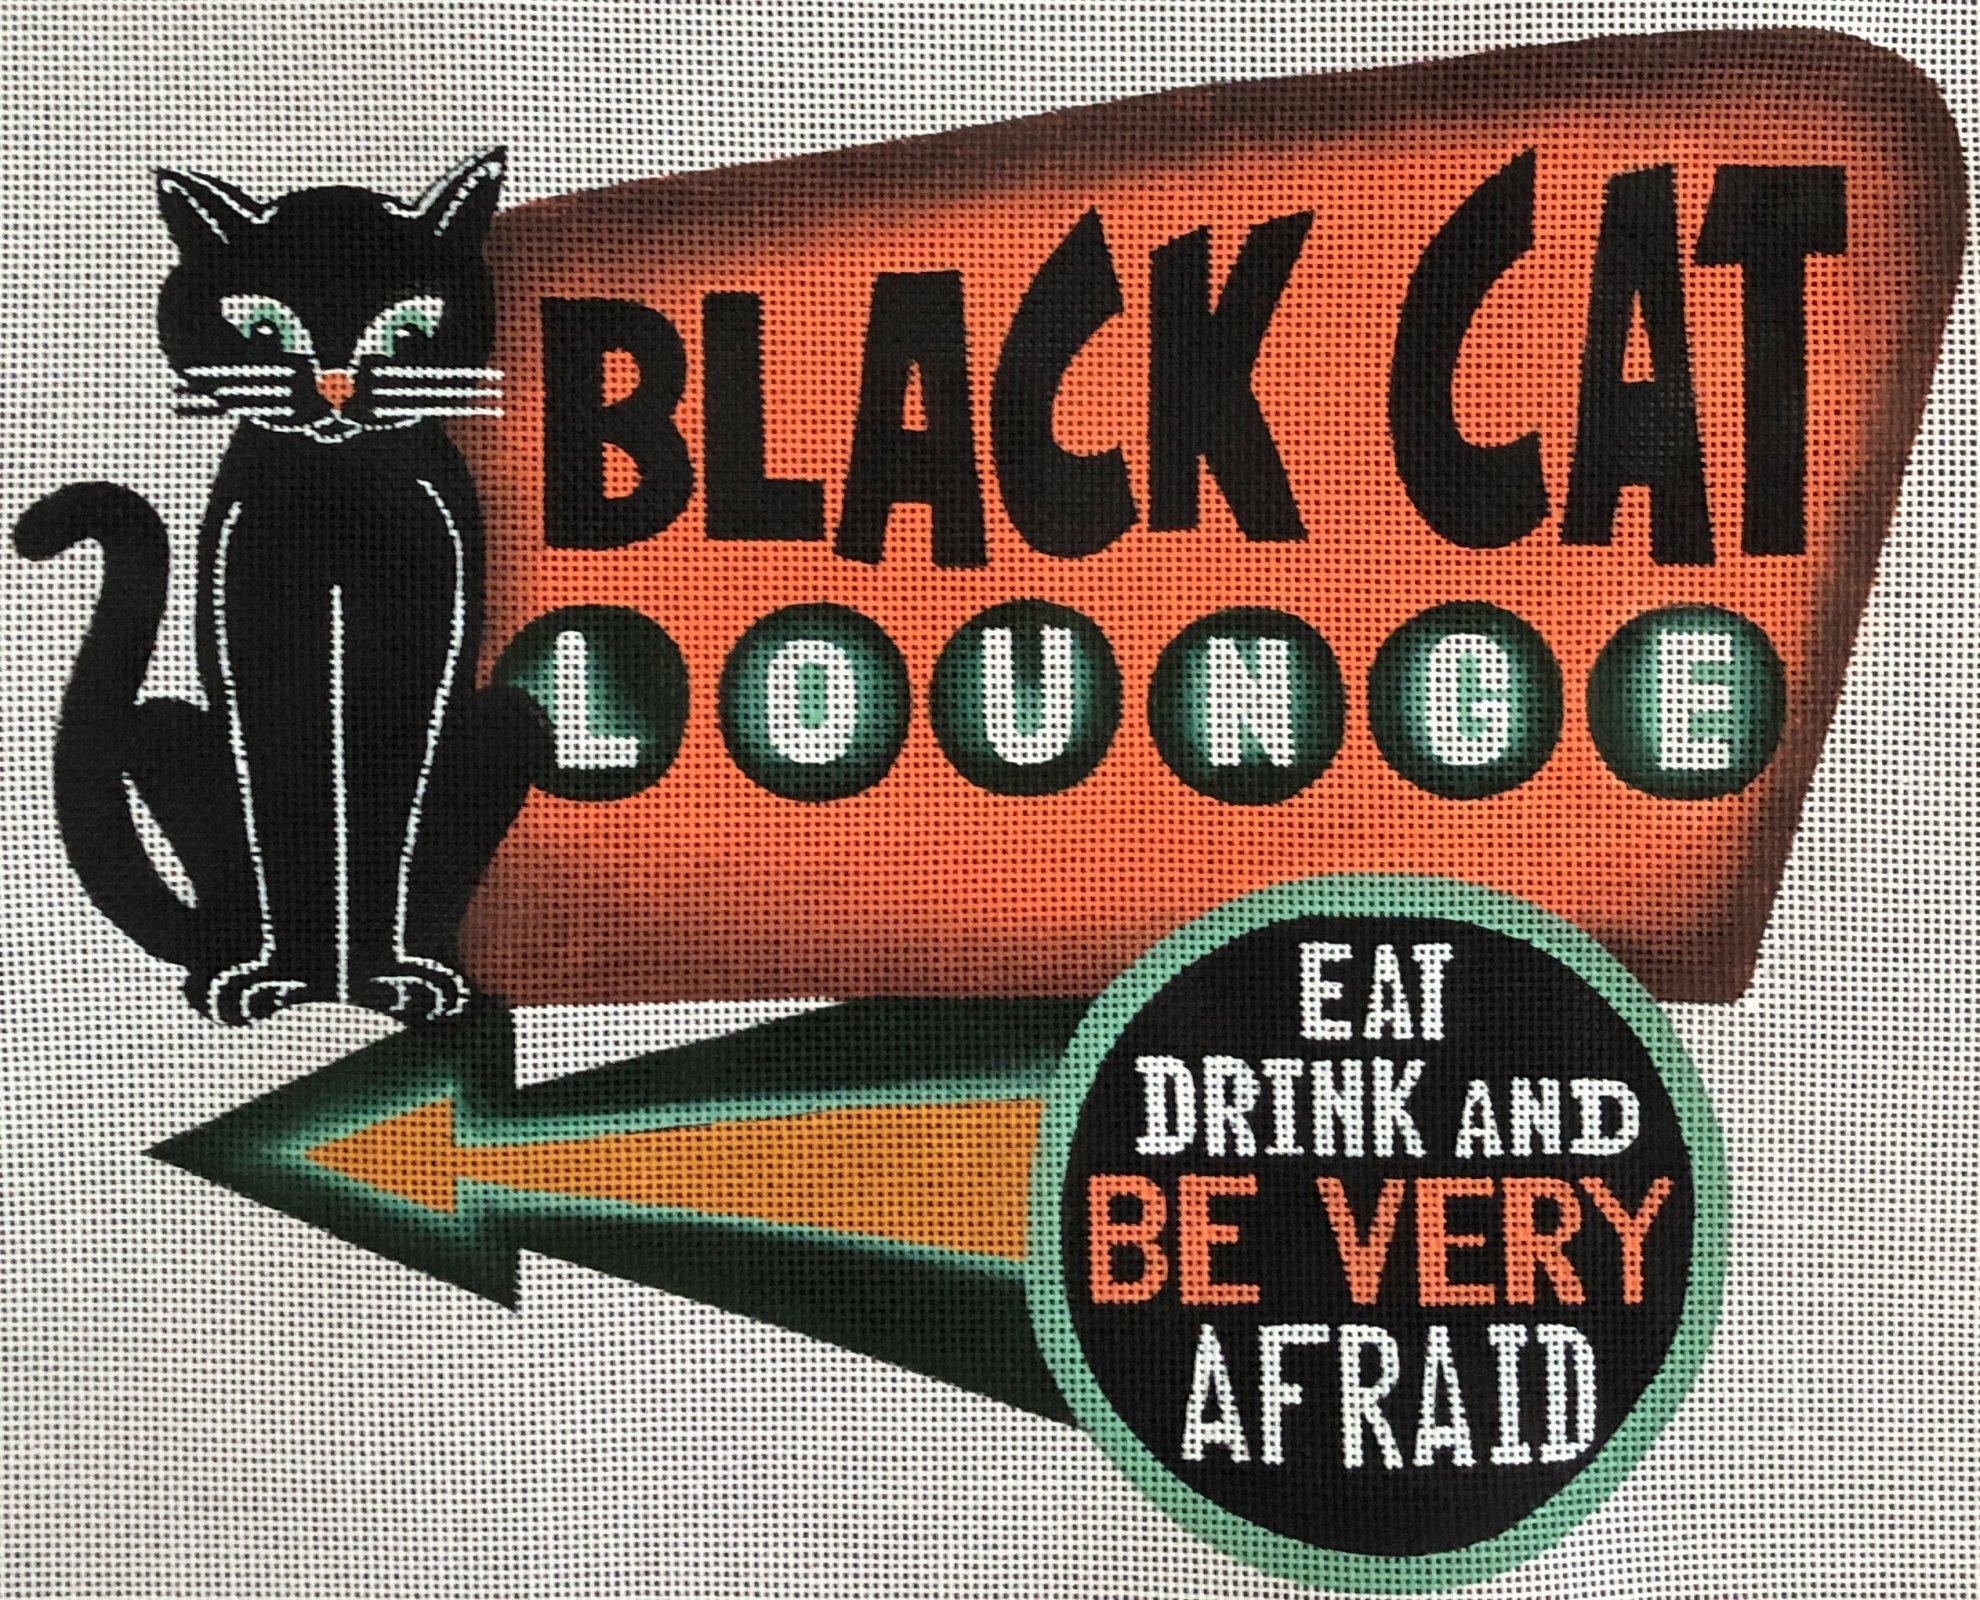 LSST02 - BLACK CAT LOUNGE